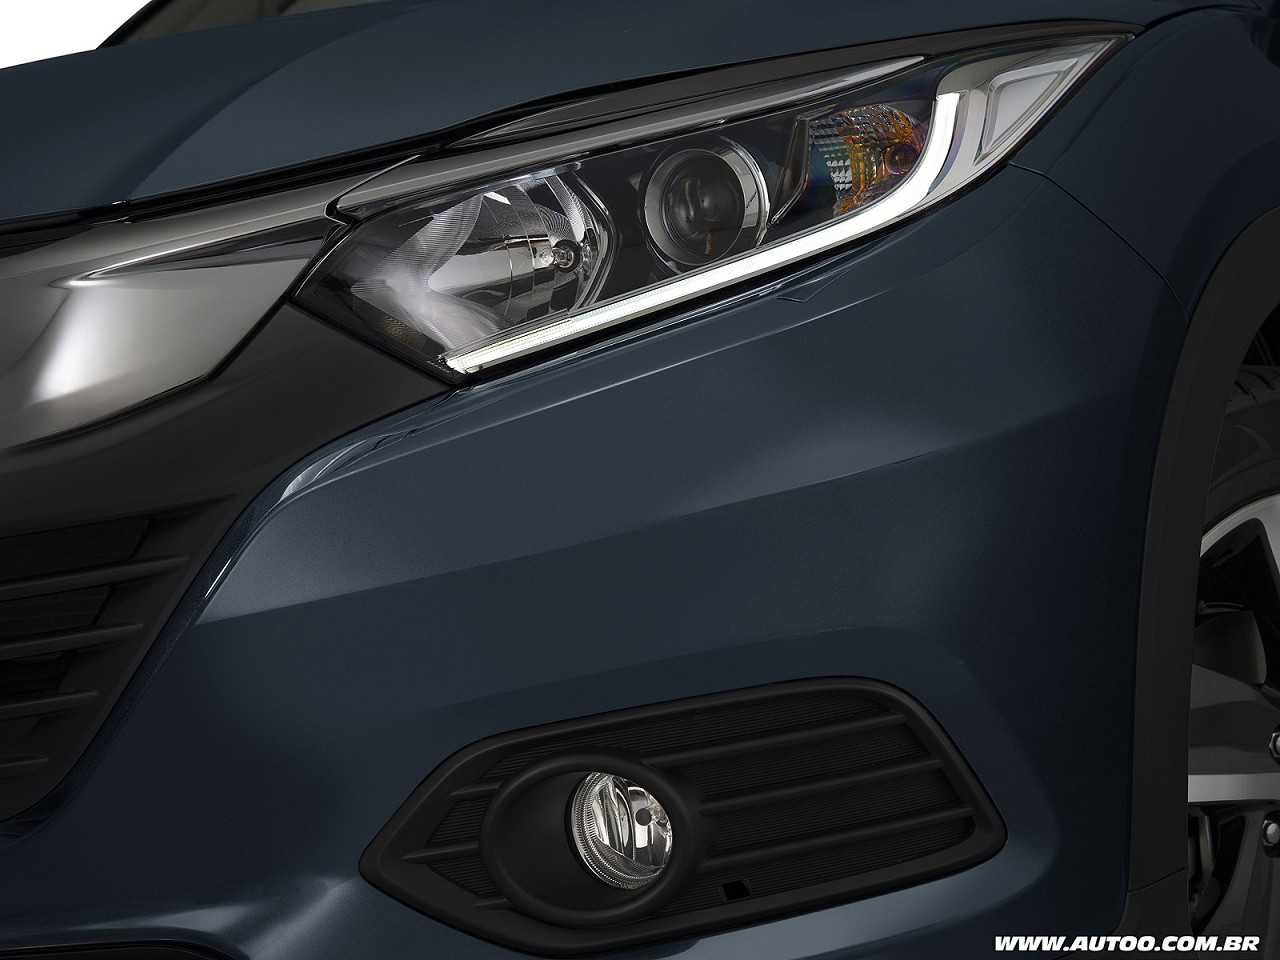 HondaHR-V 2019 - faróis